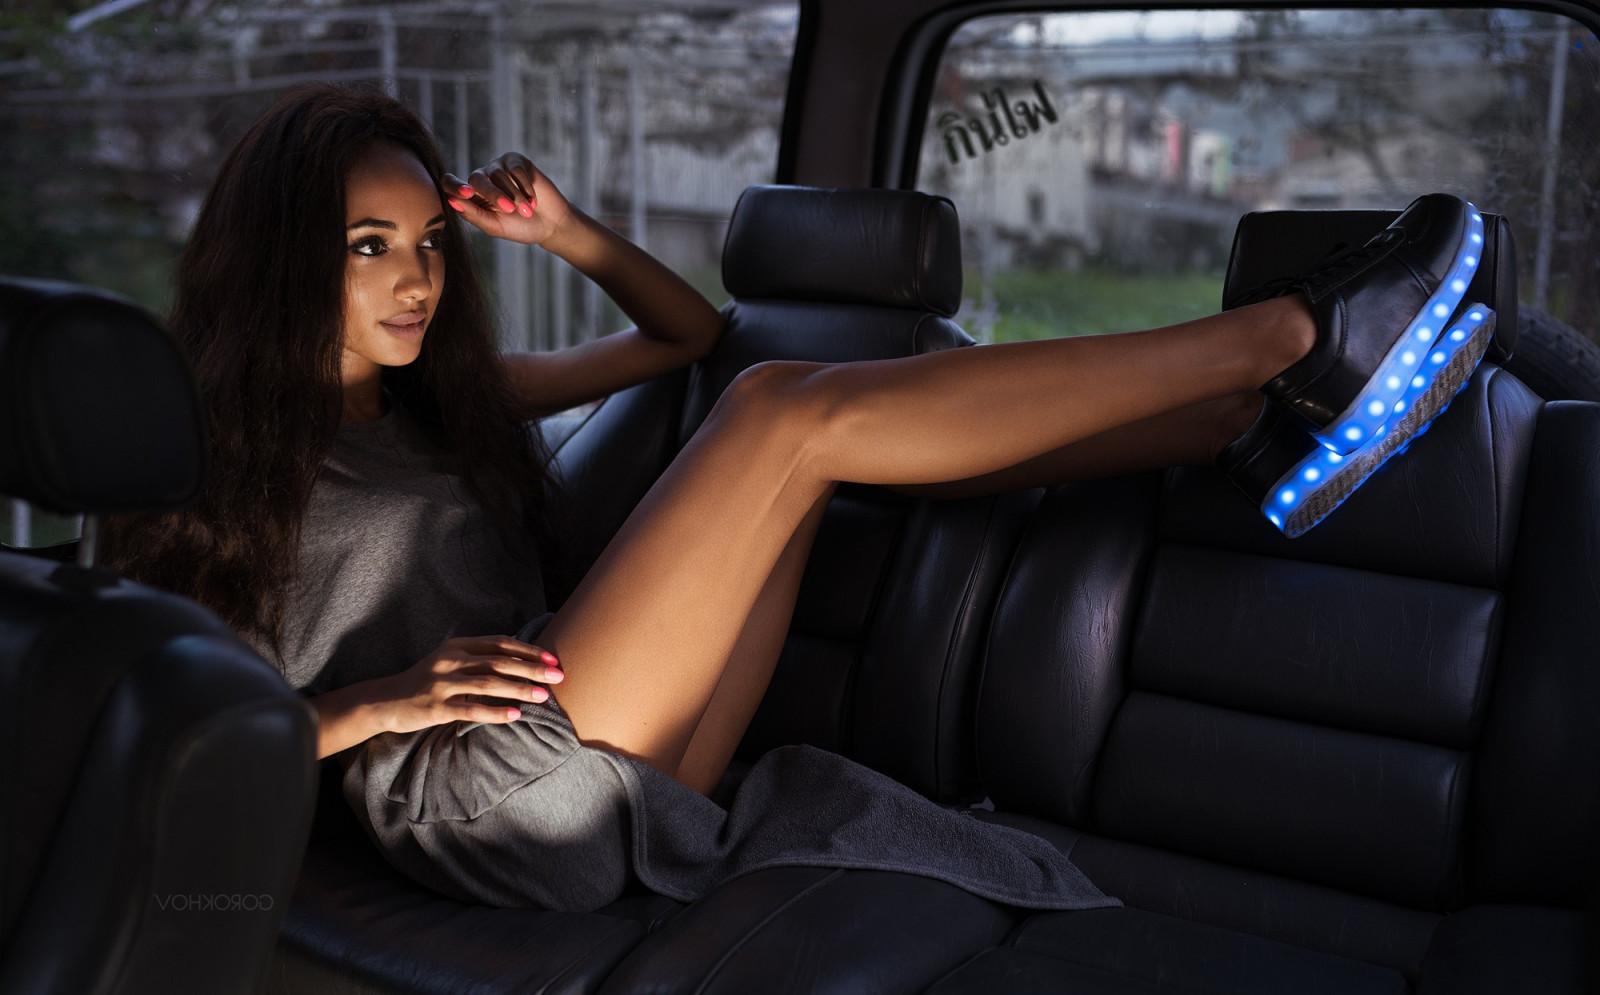 wallpaper women model long hair brunette sitting vehicle dress car interior ivan. Black Bedroom Furniture Sets. Home Design Ideas